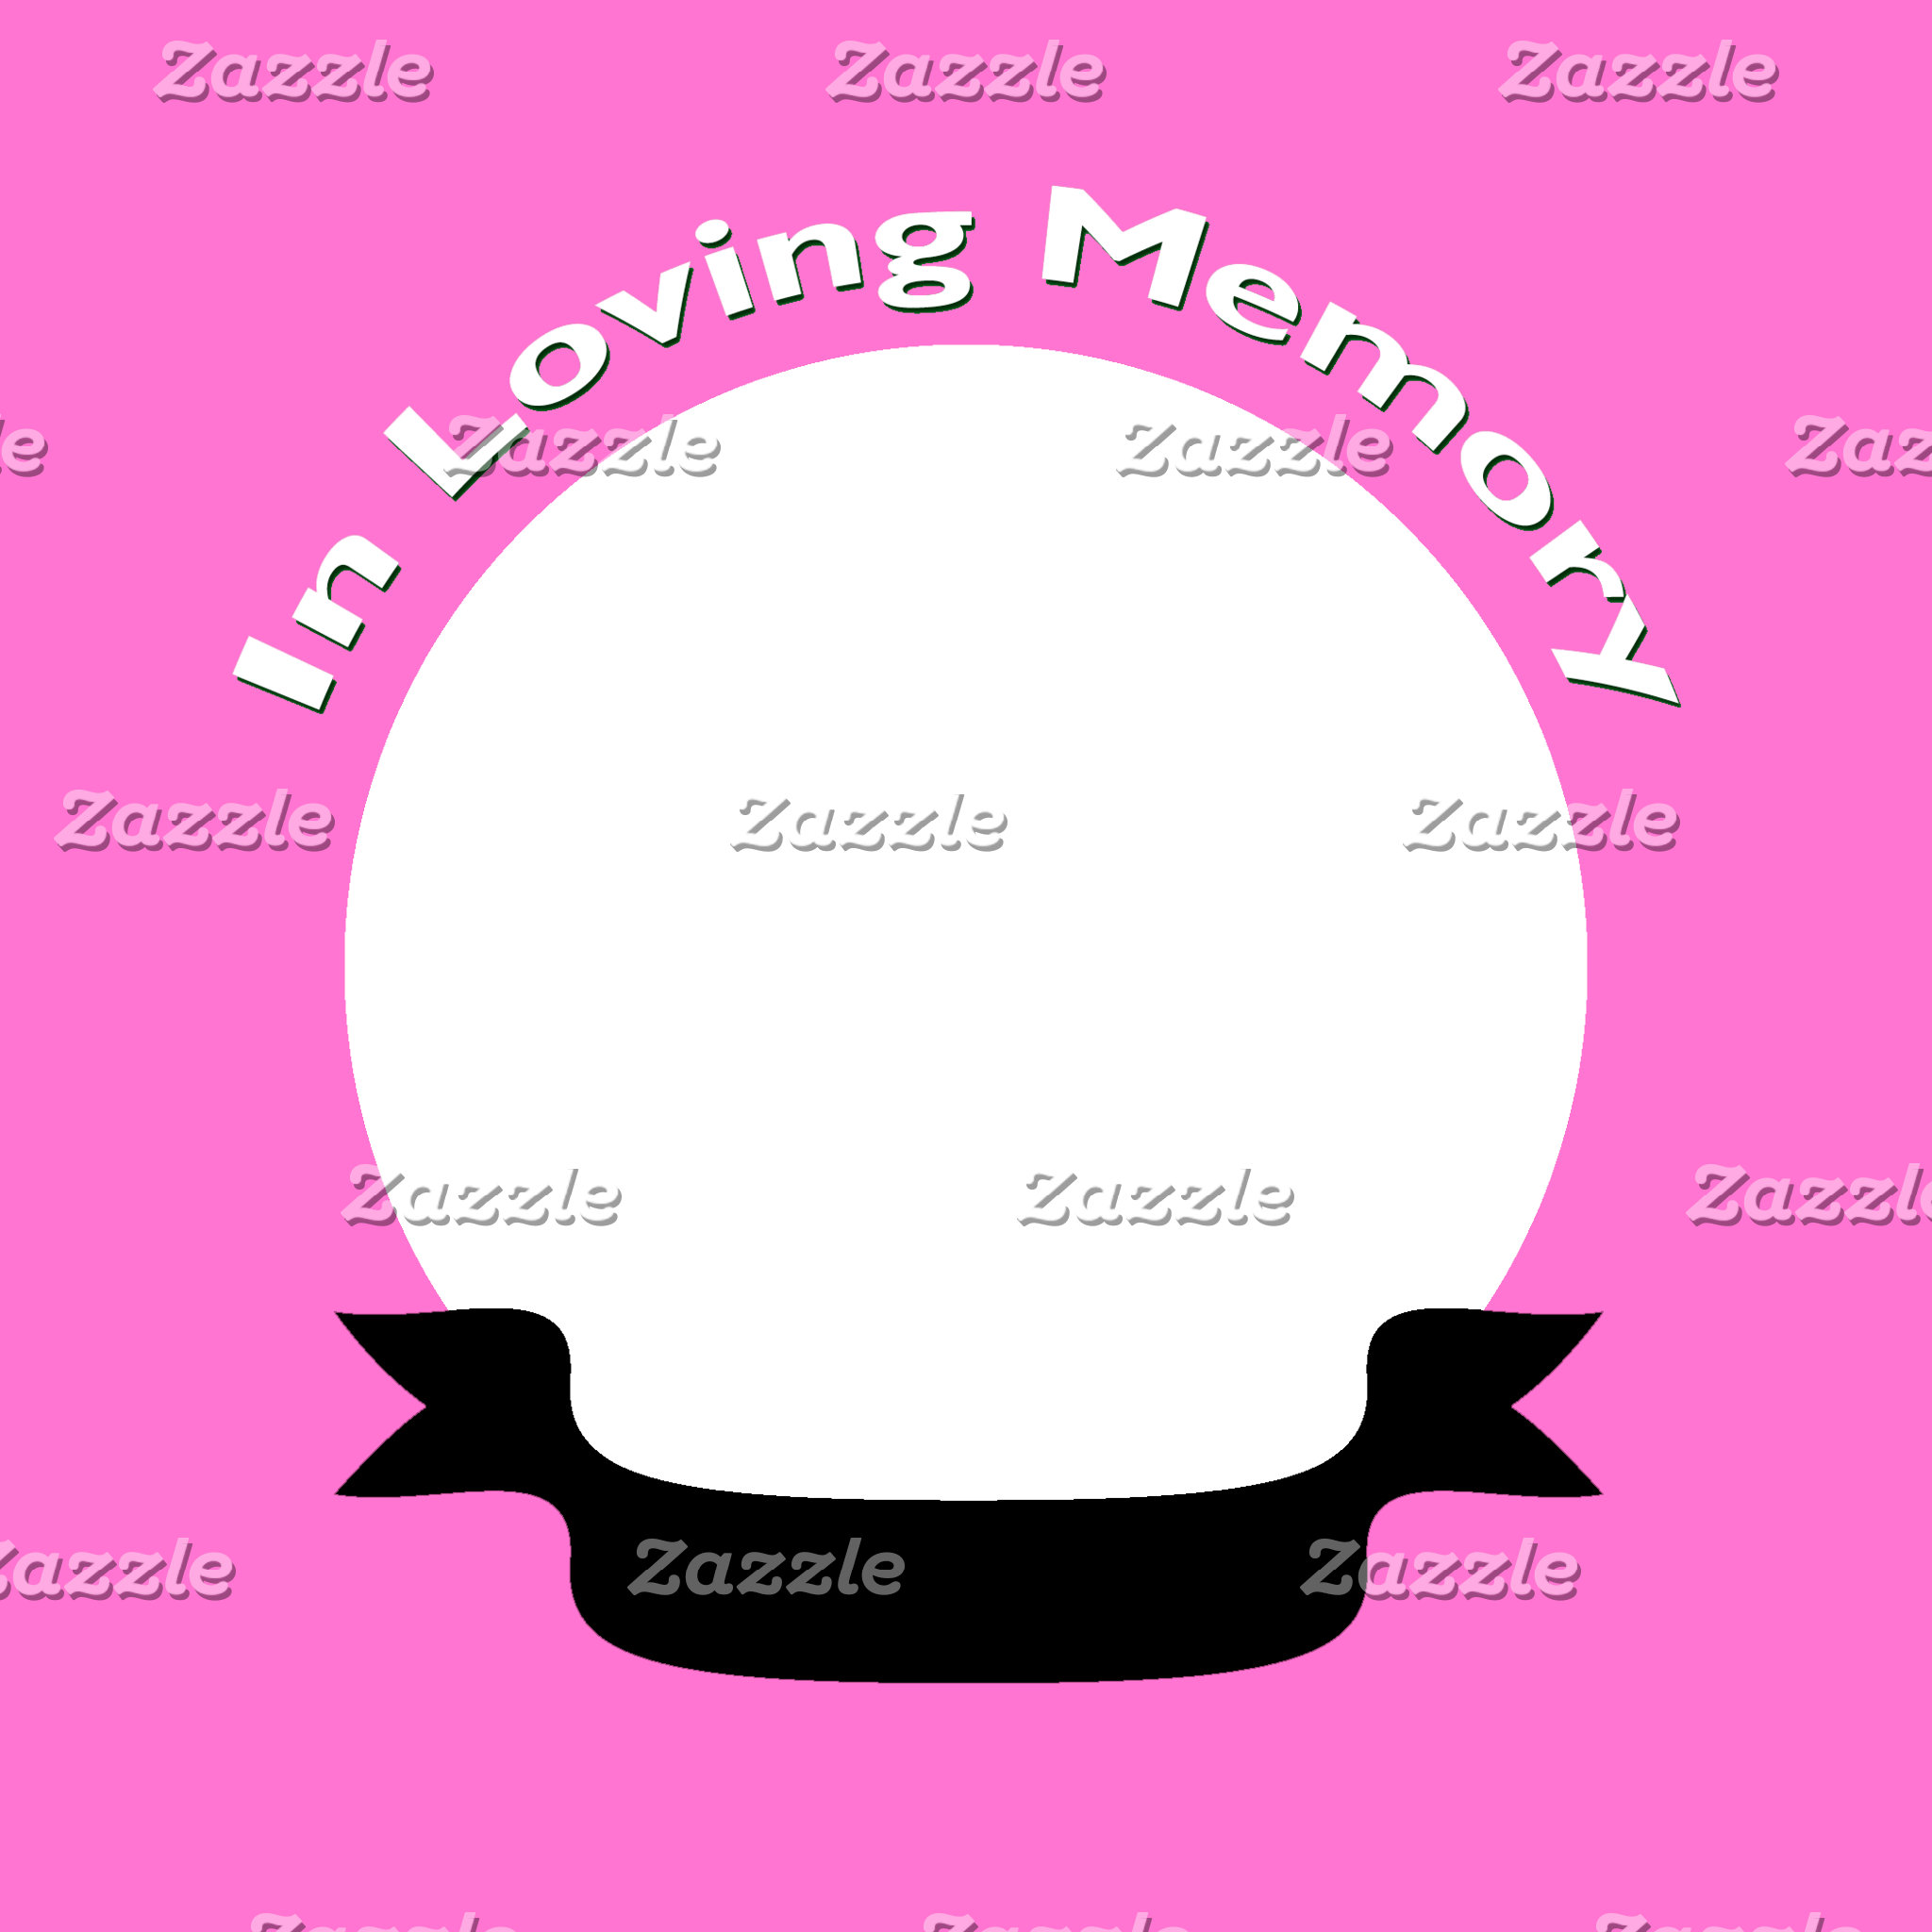 Pink - In memory of